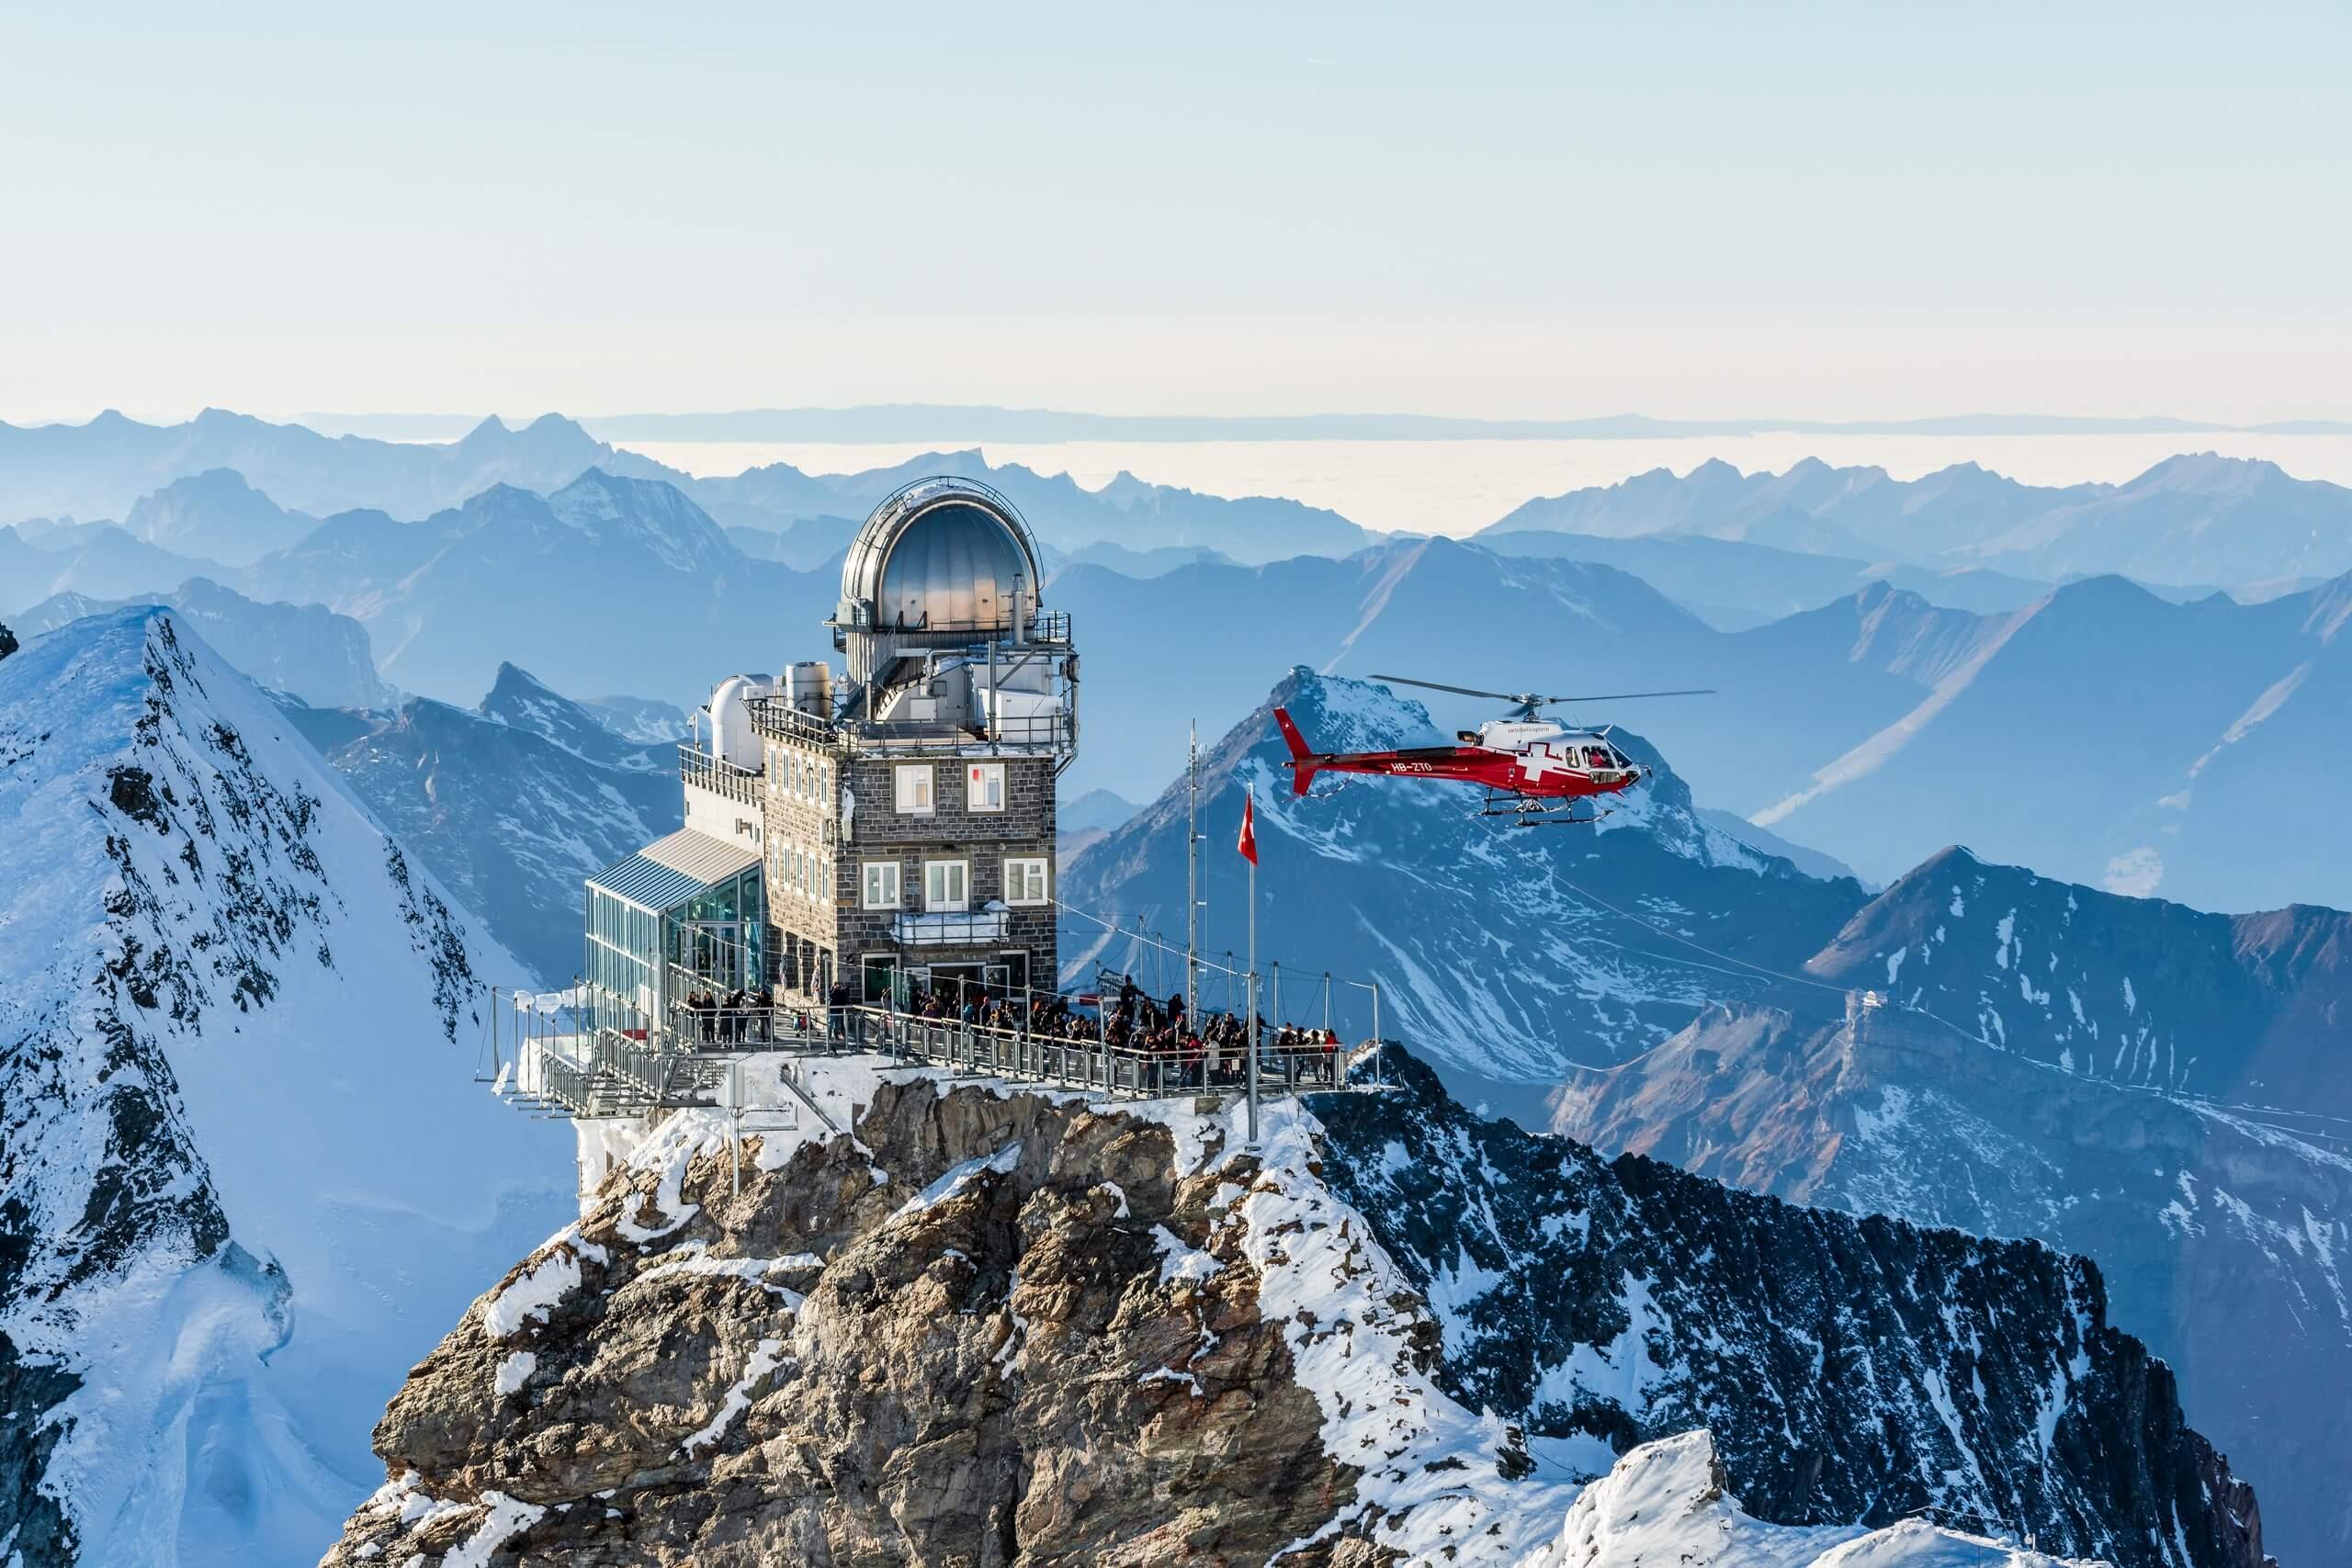 swiss-helicopter-rundflug-jungfraujoch-berge